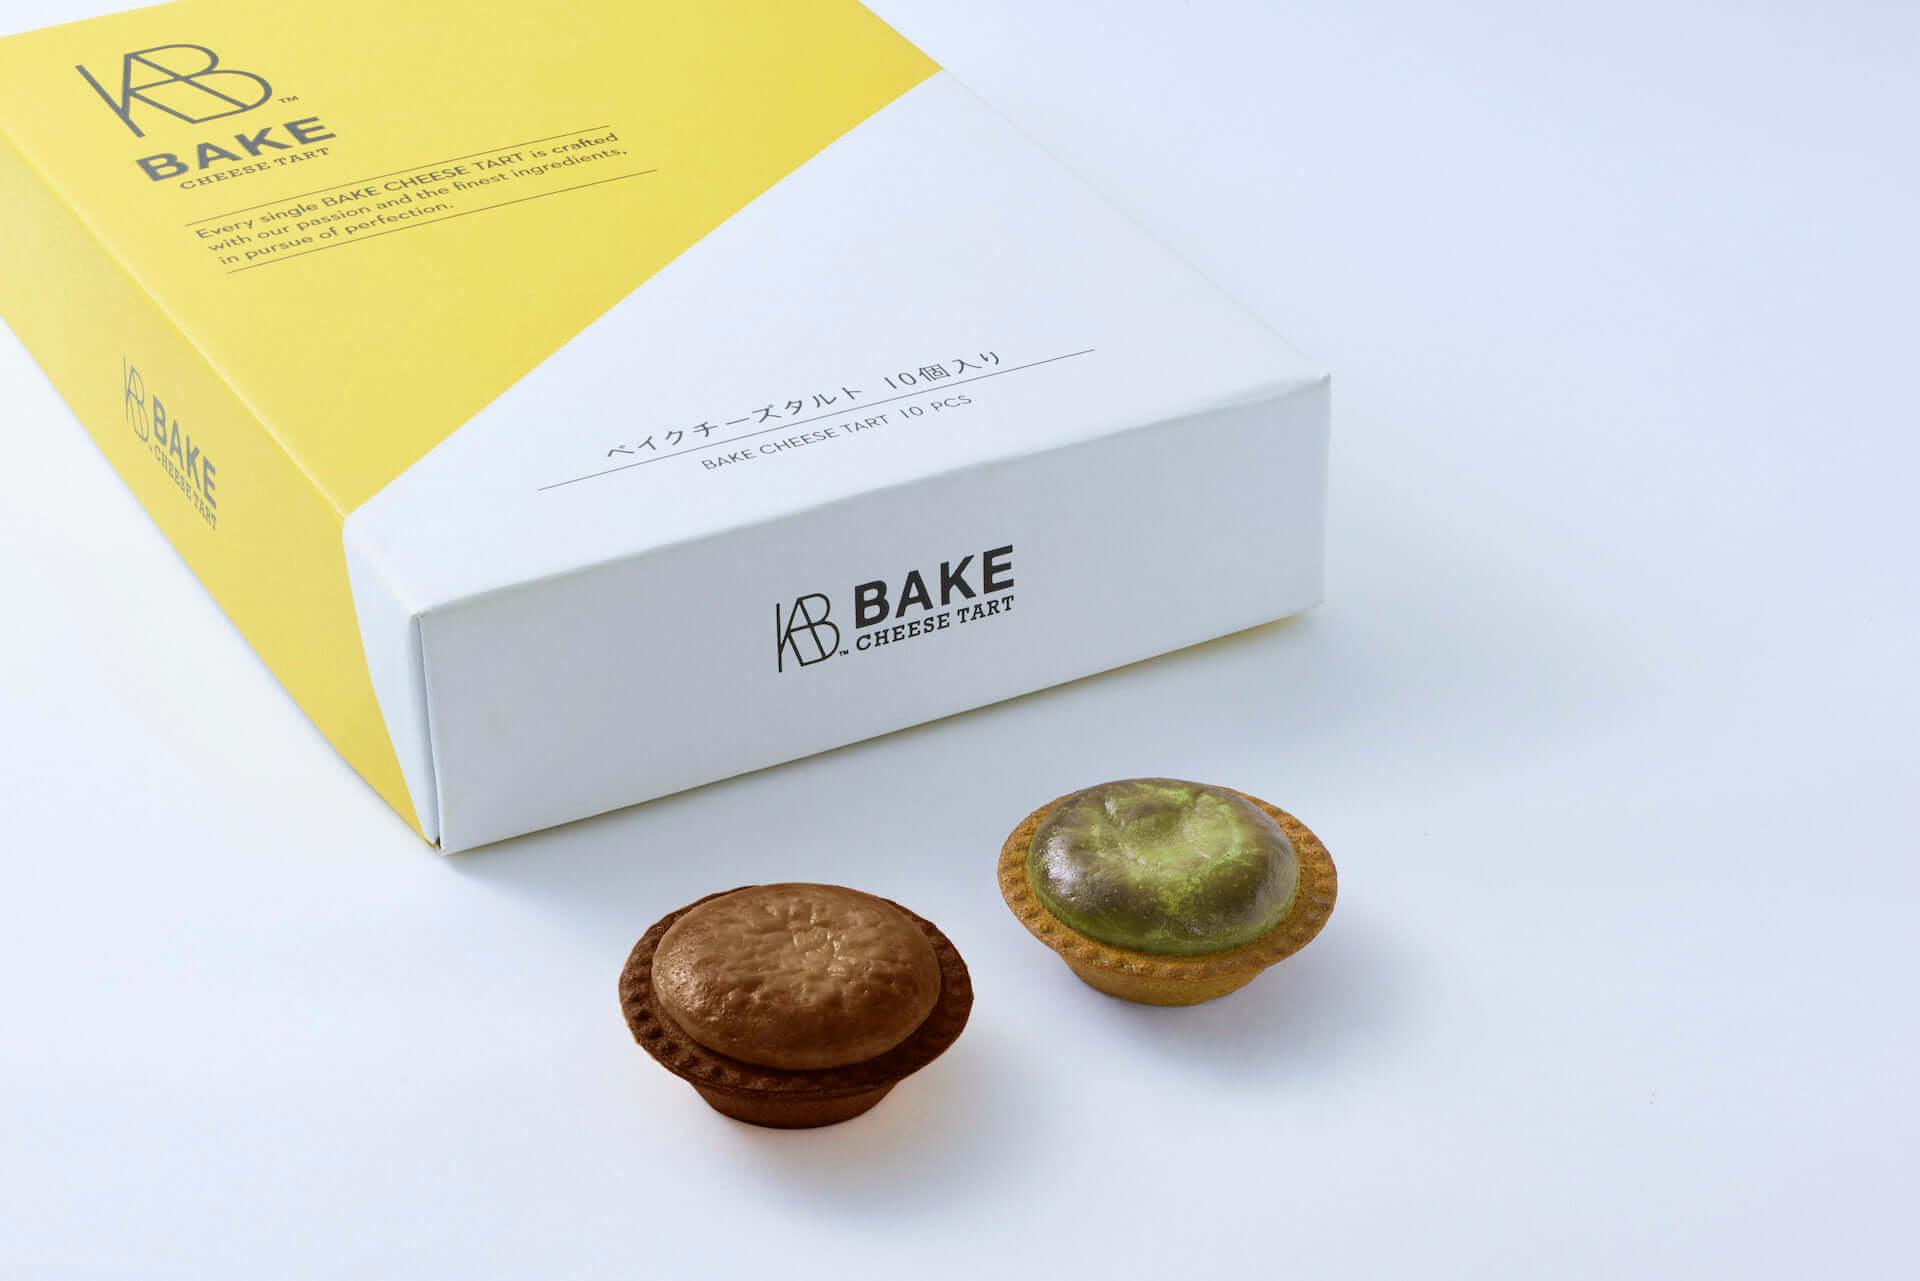 BAKE初の公式オンラインショップ「BAKE THE ONLINE」がオープン!チーズタルト10P BOXが50%OFFの特別価格に gourmet_bake_online_02-1920x1281